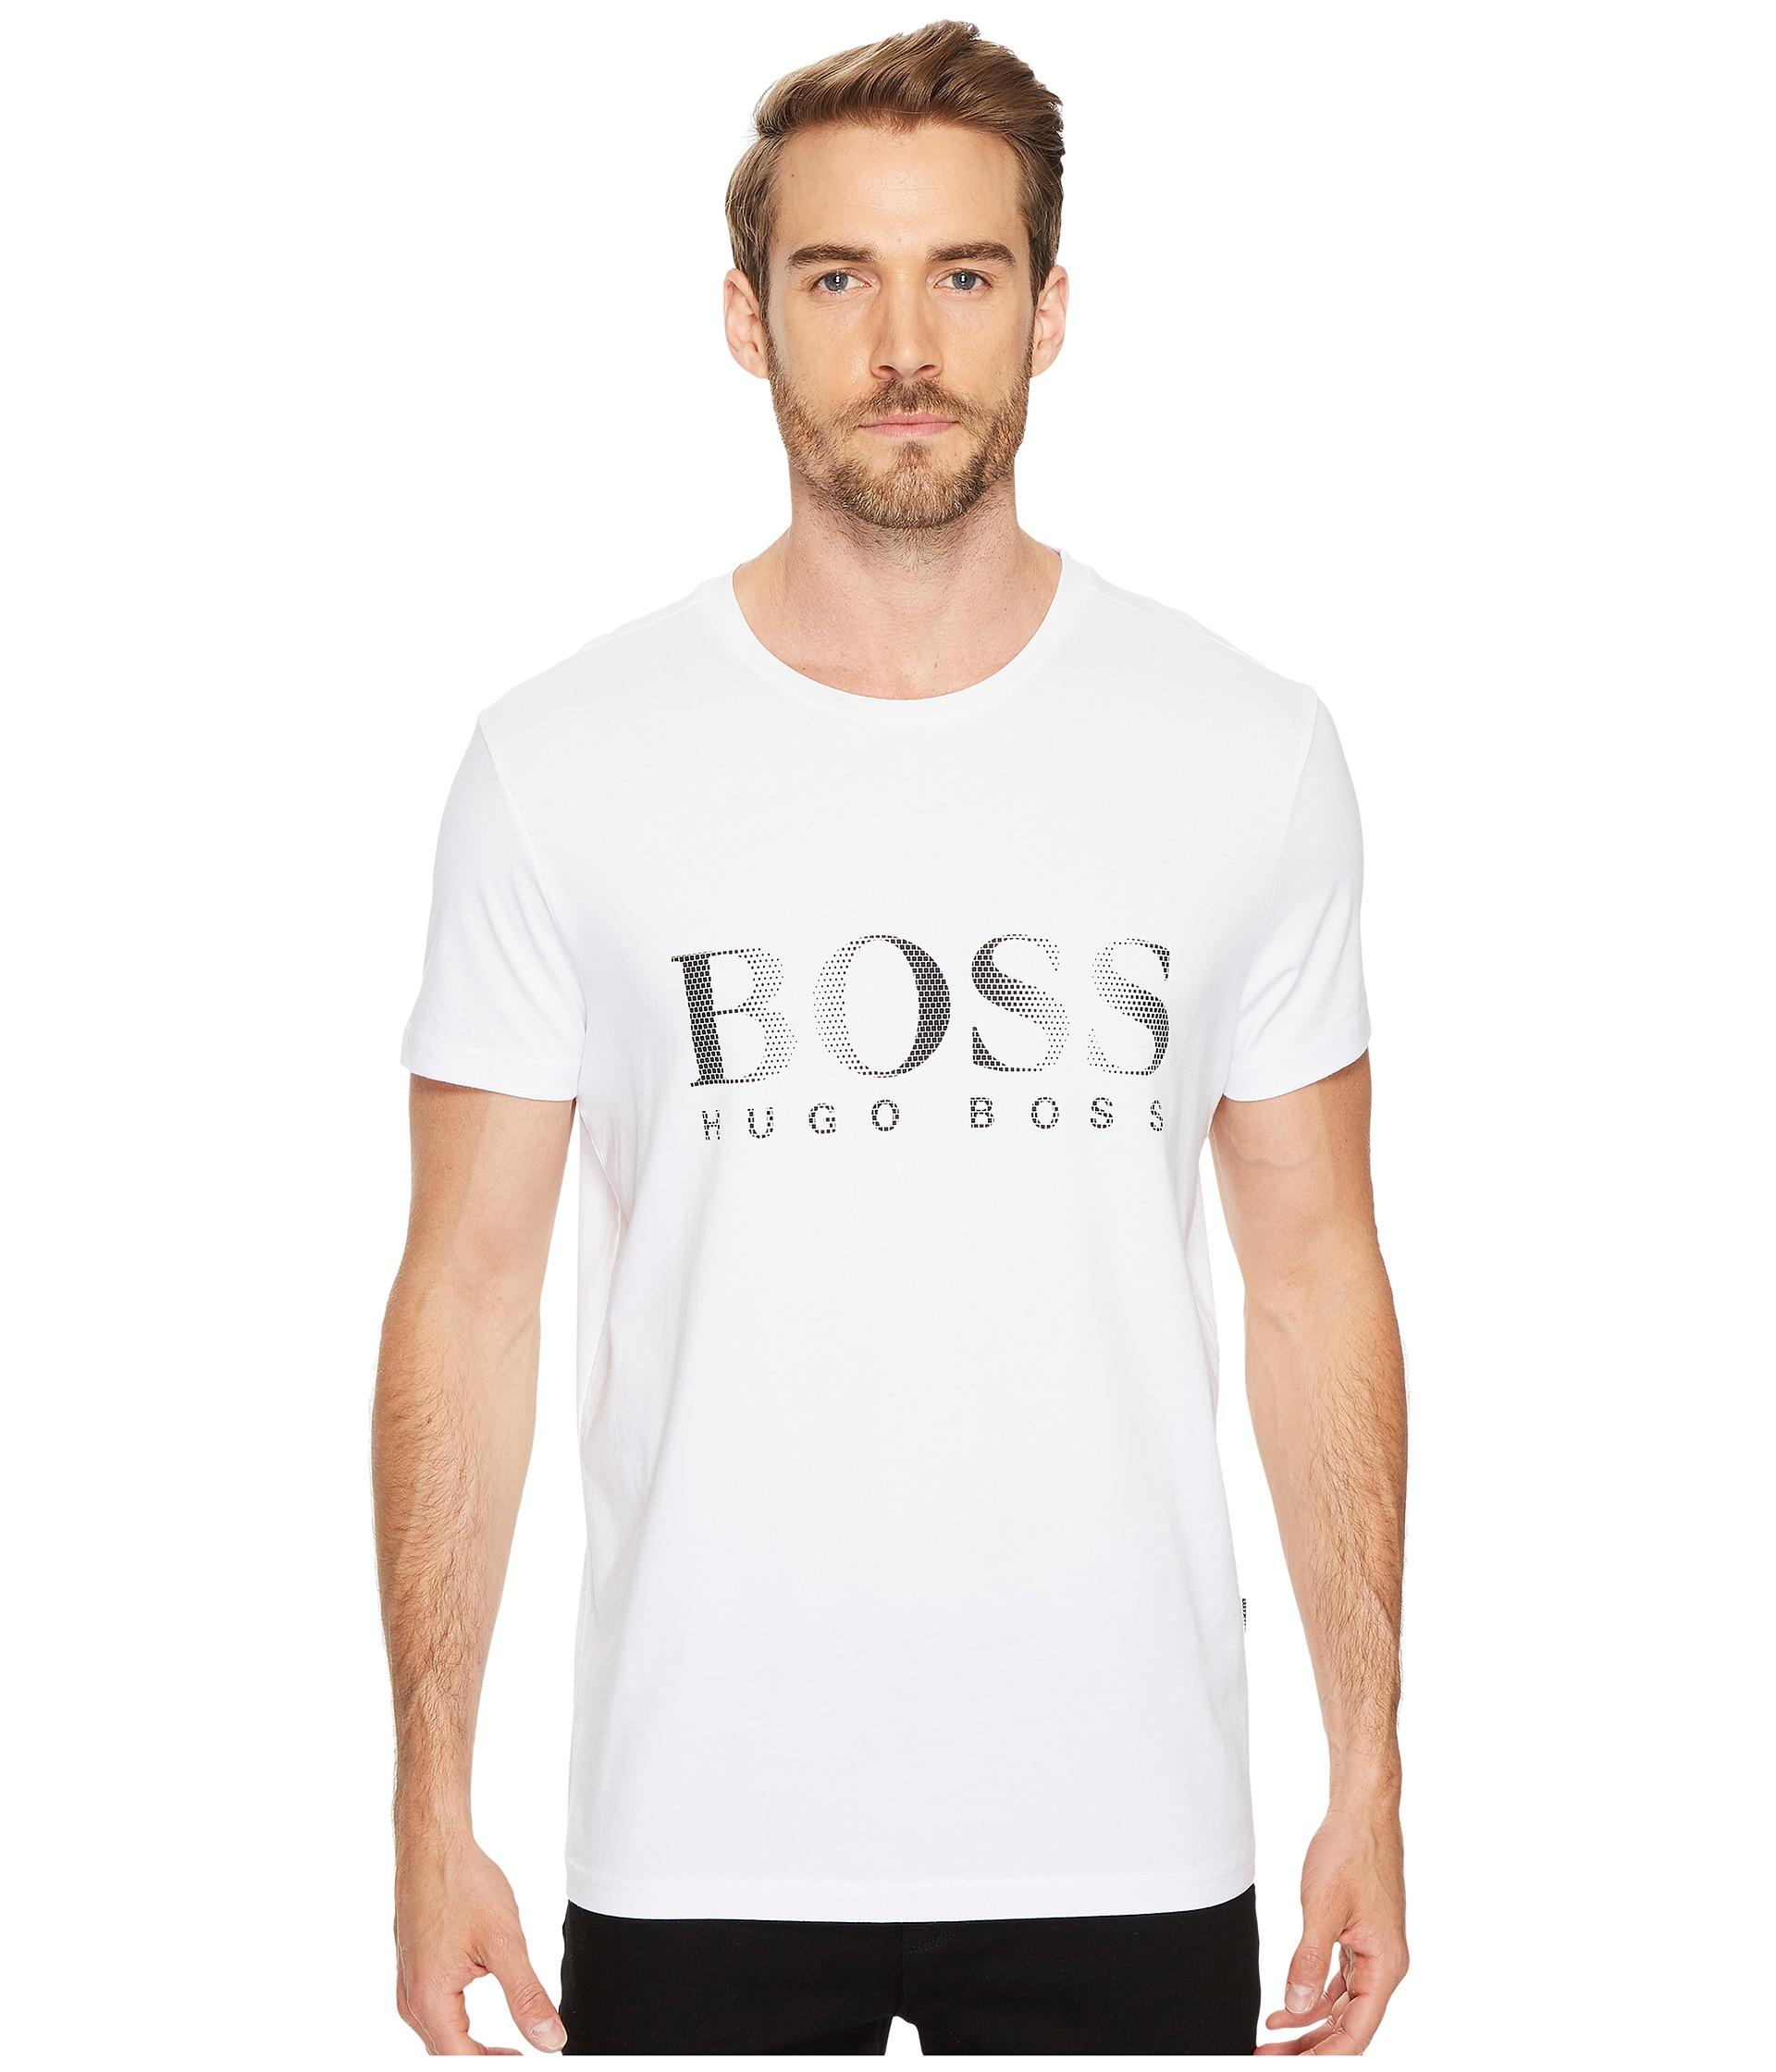 boss hugo boss t shirt round neck 10144419 at. Black Bedroom Furniture Sets. Home Design Ideas